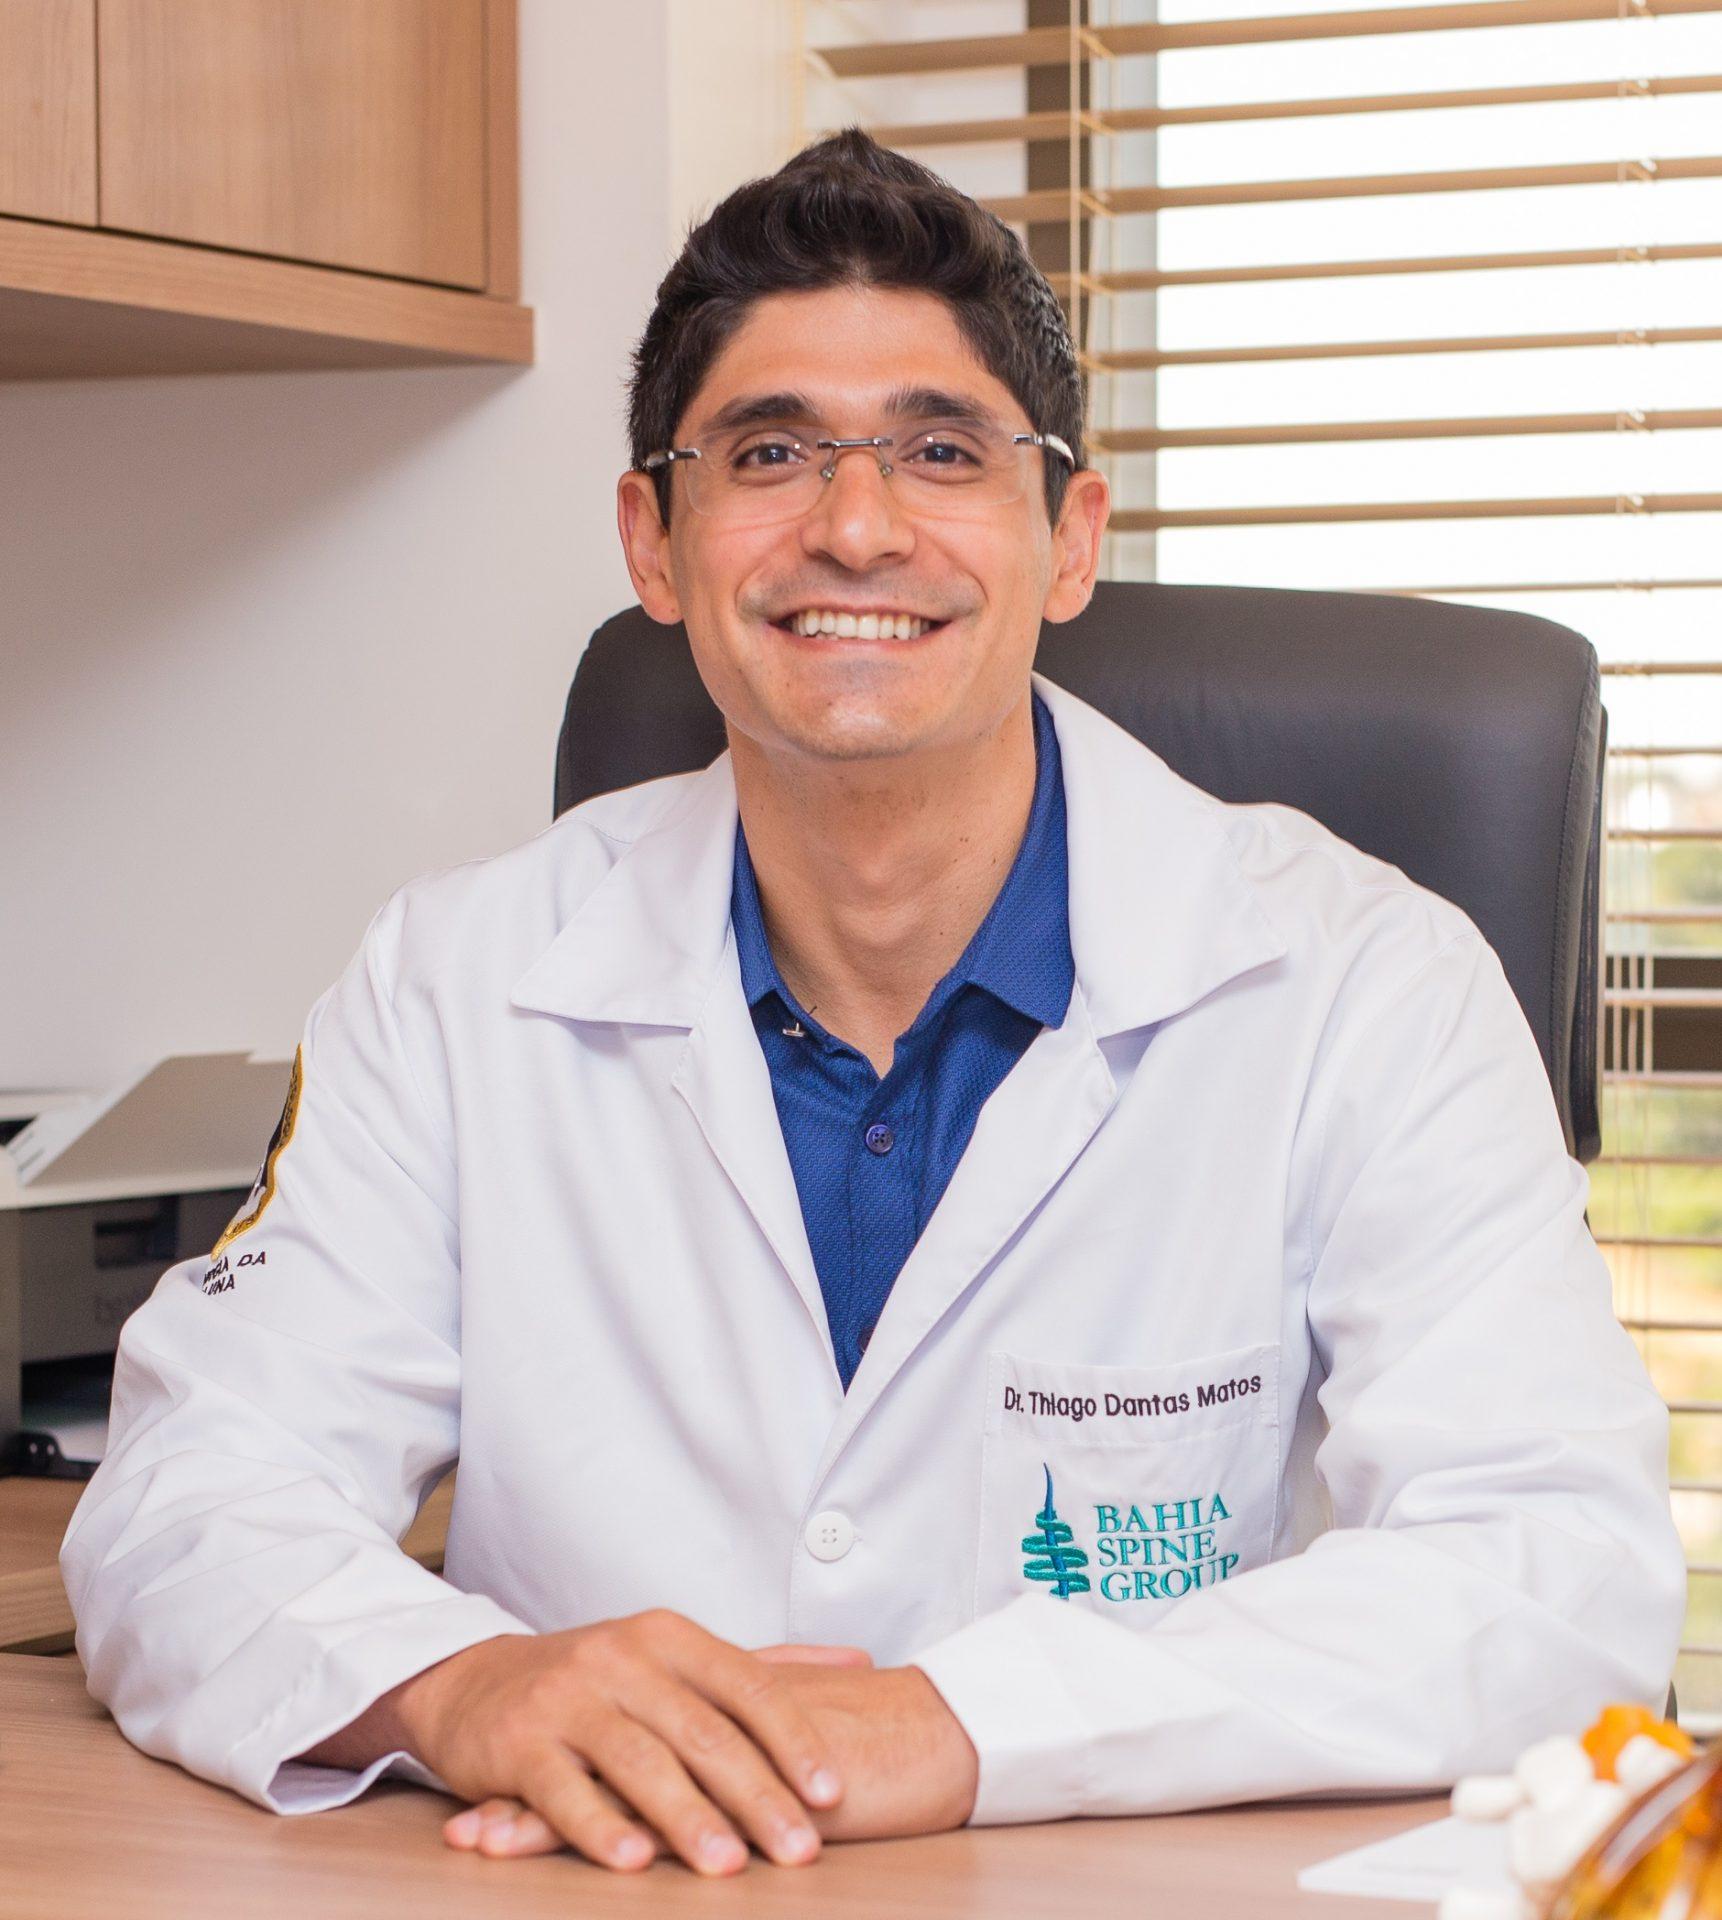 Dr. Thiago Matos